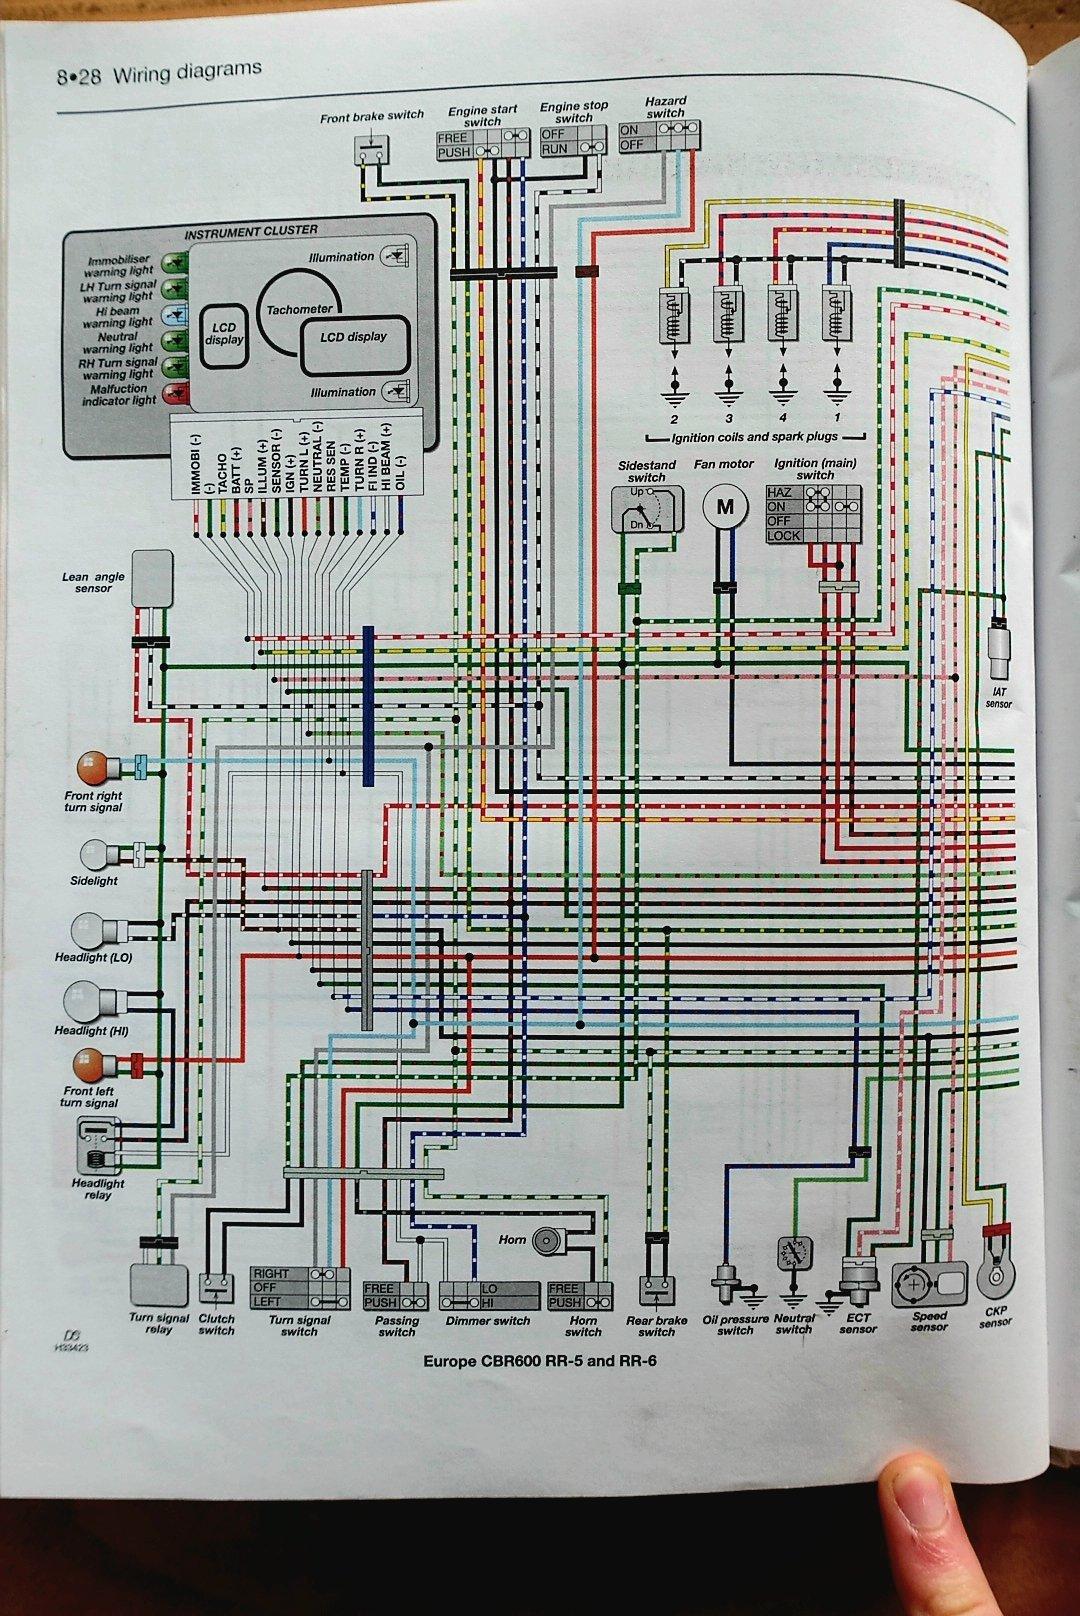 Wiring Schematic Diagram For A 2006 Cbr600rr